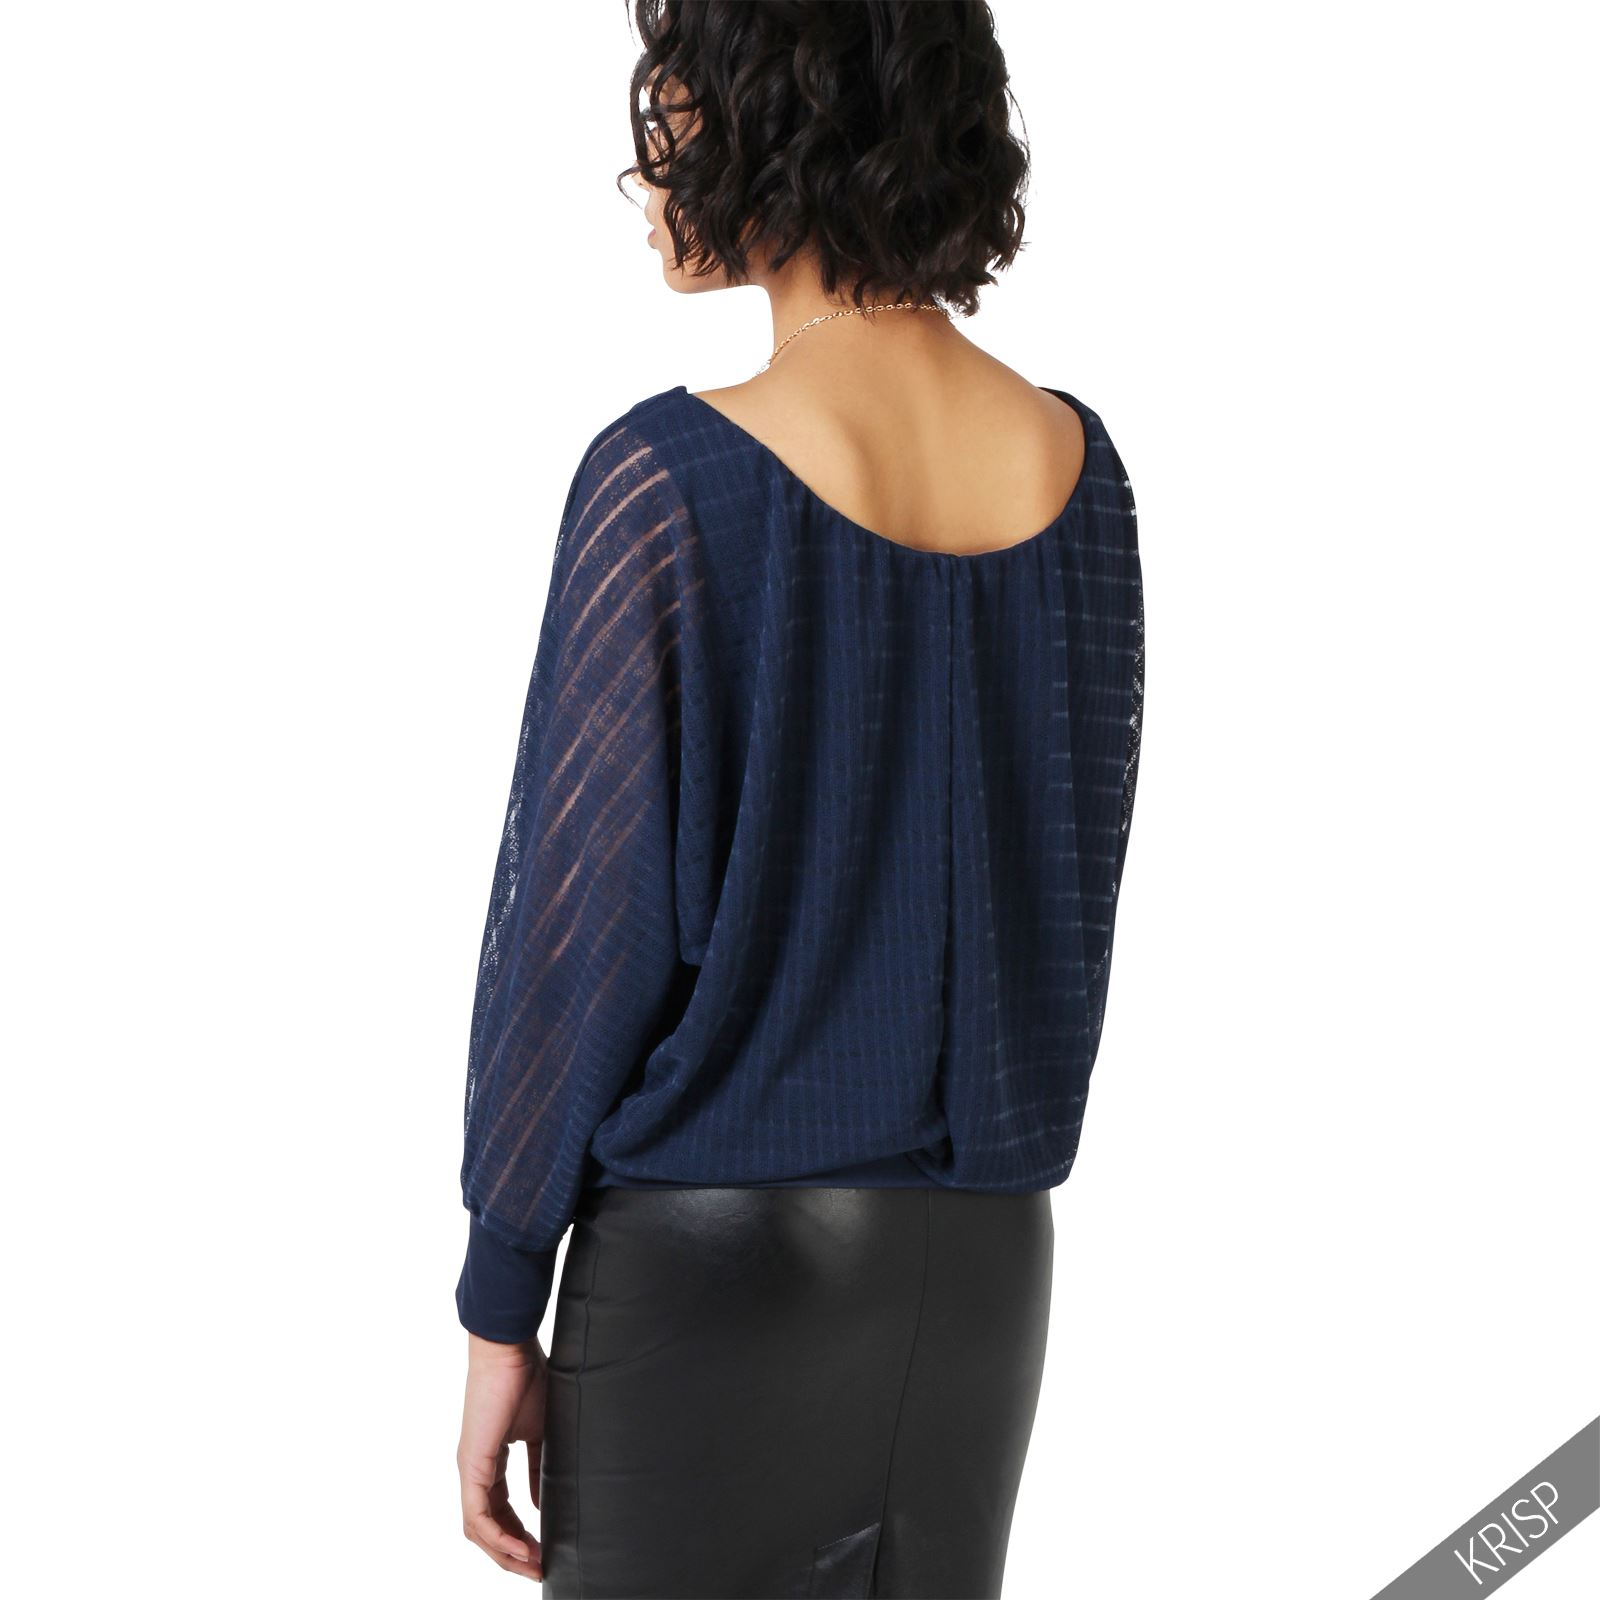 damen elegante bluse fledermaus oberteil gestreiftes shirt langarm tunika ebay. Black Bedroom Furniture Sets. Home Design Ideas